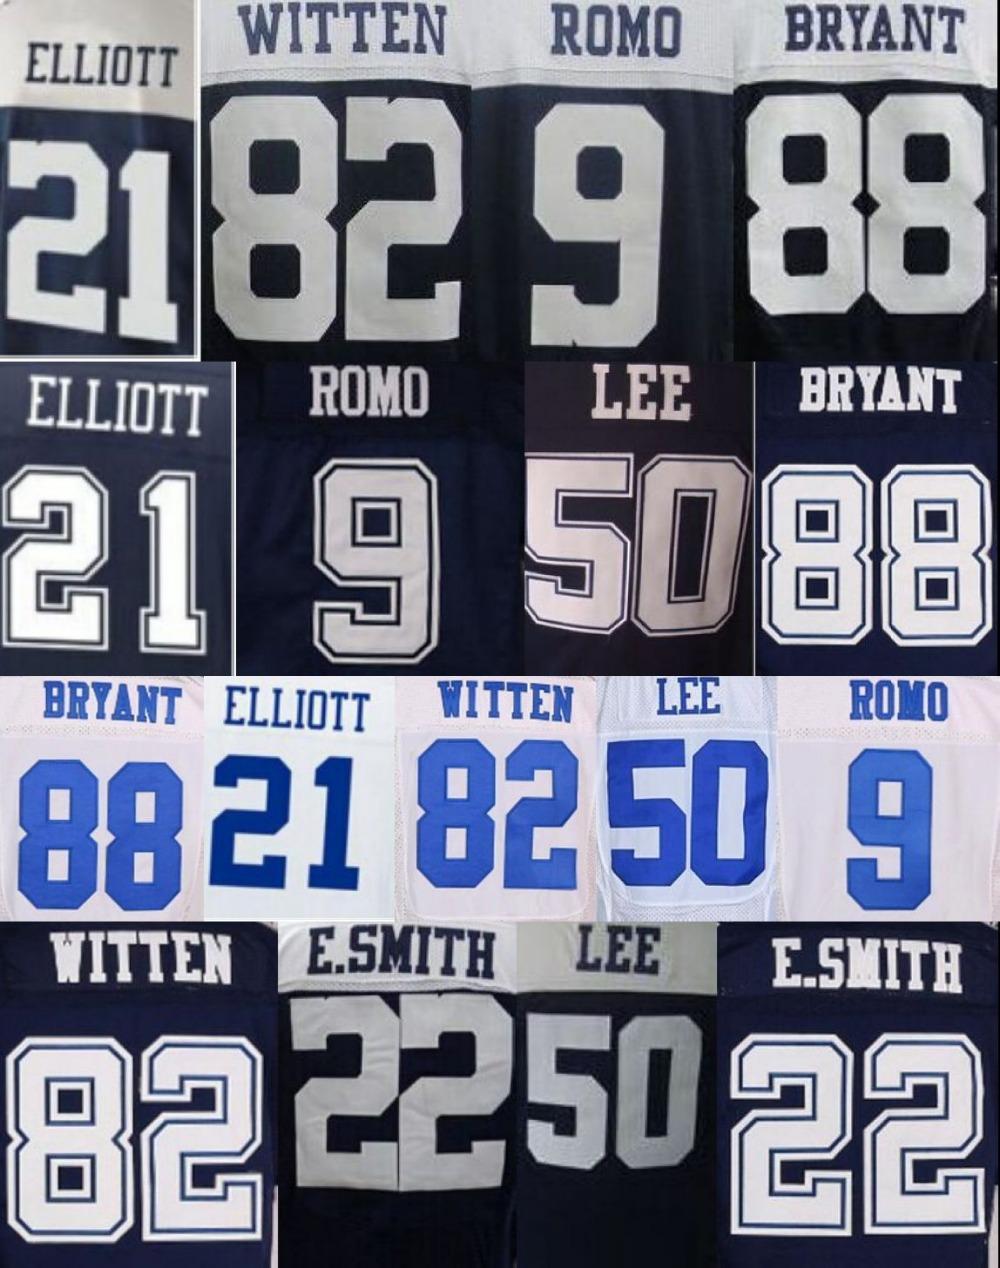 2016 New Draft #21 Ezekiel Elliott jersey 88 Dez Bryant Jersey Tony Romo 50 Sean Lee 82 Jason Witten 22 Emmitt Smith size M-3XL(China (Mainland))